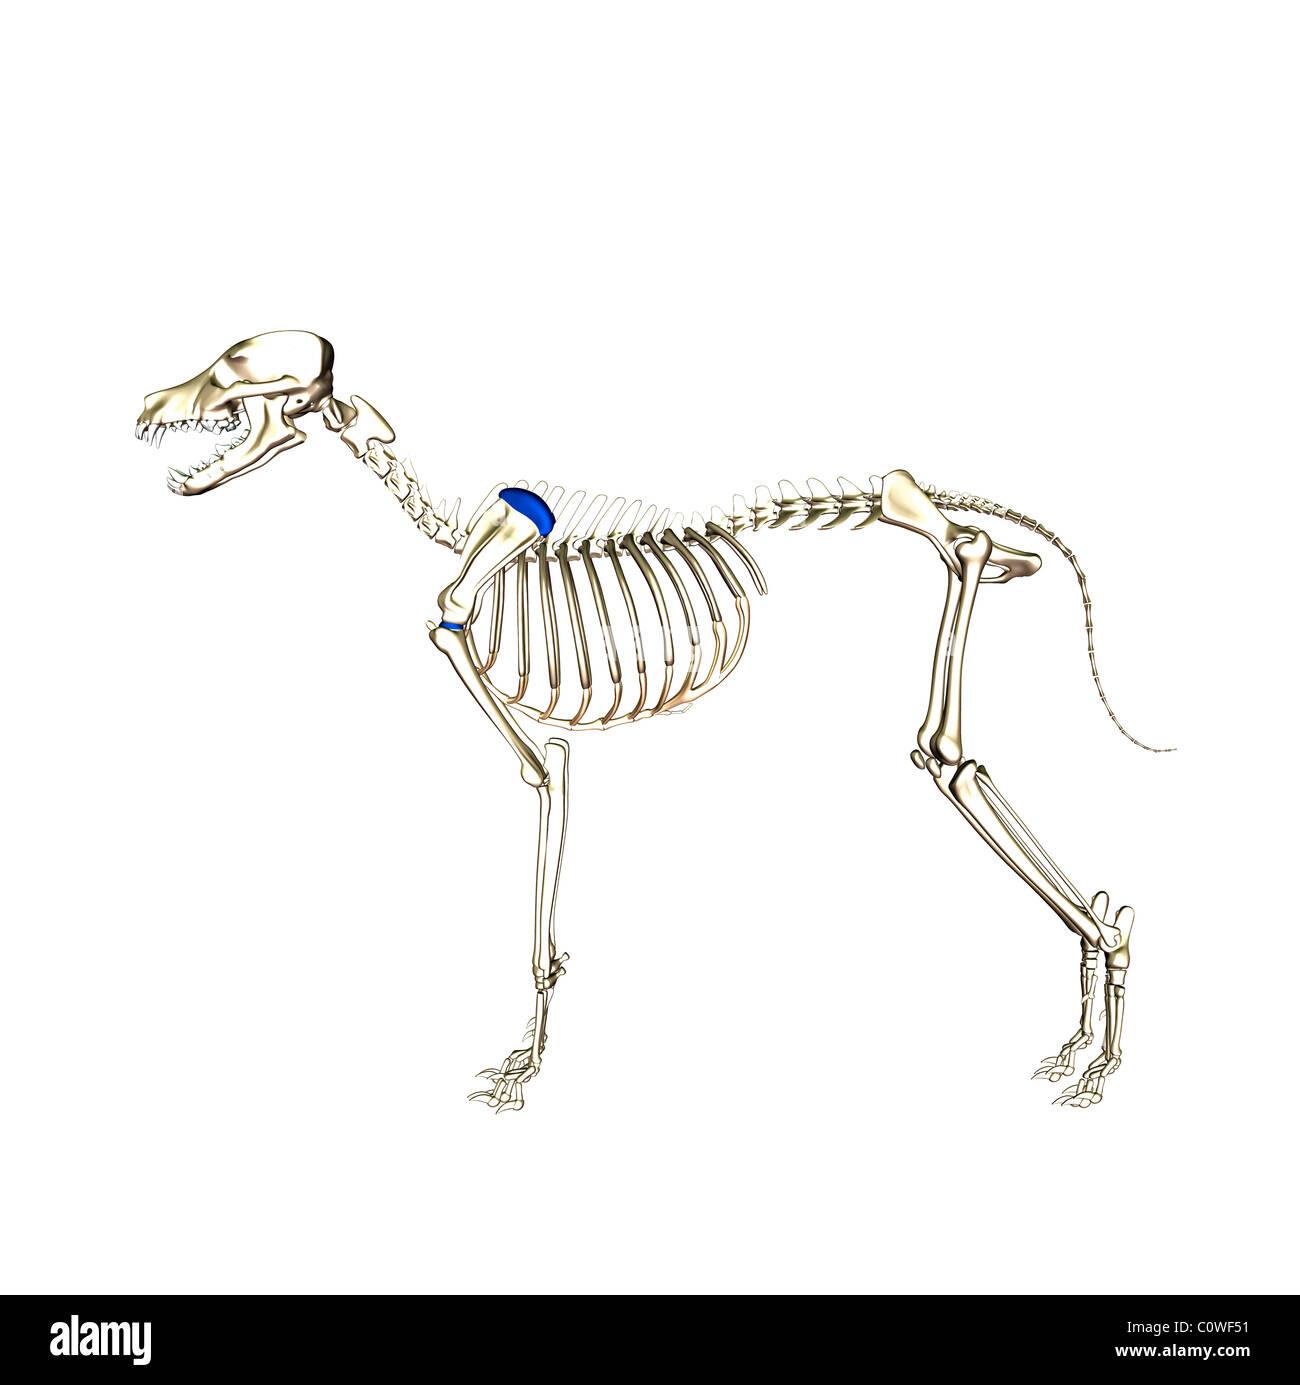 Hund Anatomie Skelett Stockfoto, Bild: 34981437 - Alamy